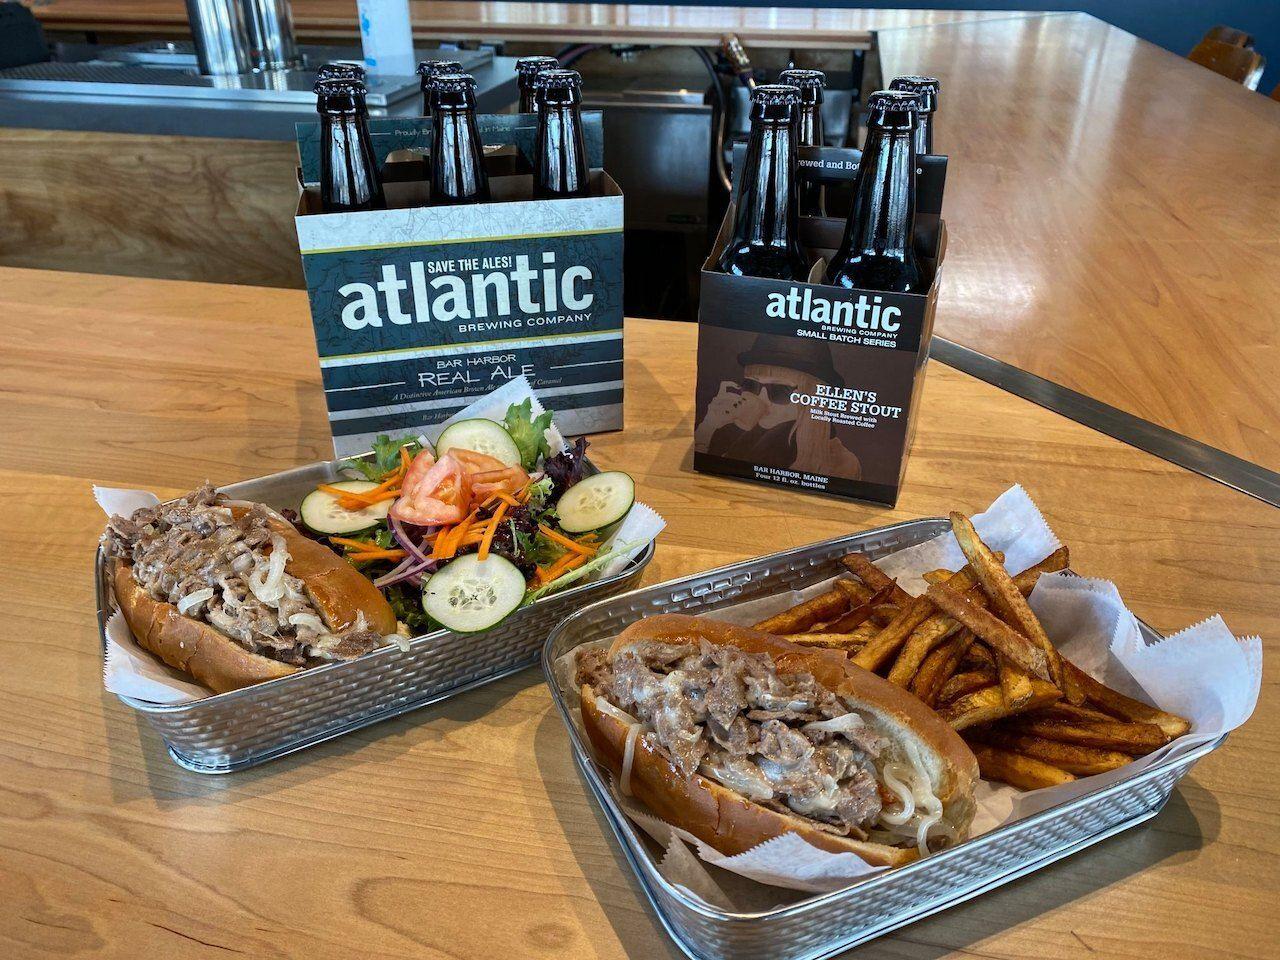 Atlantic Brewing